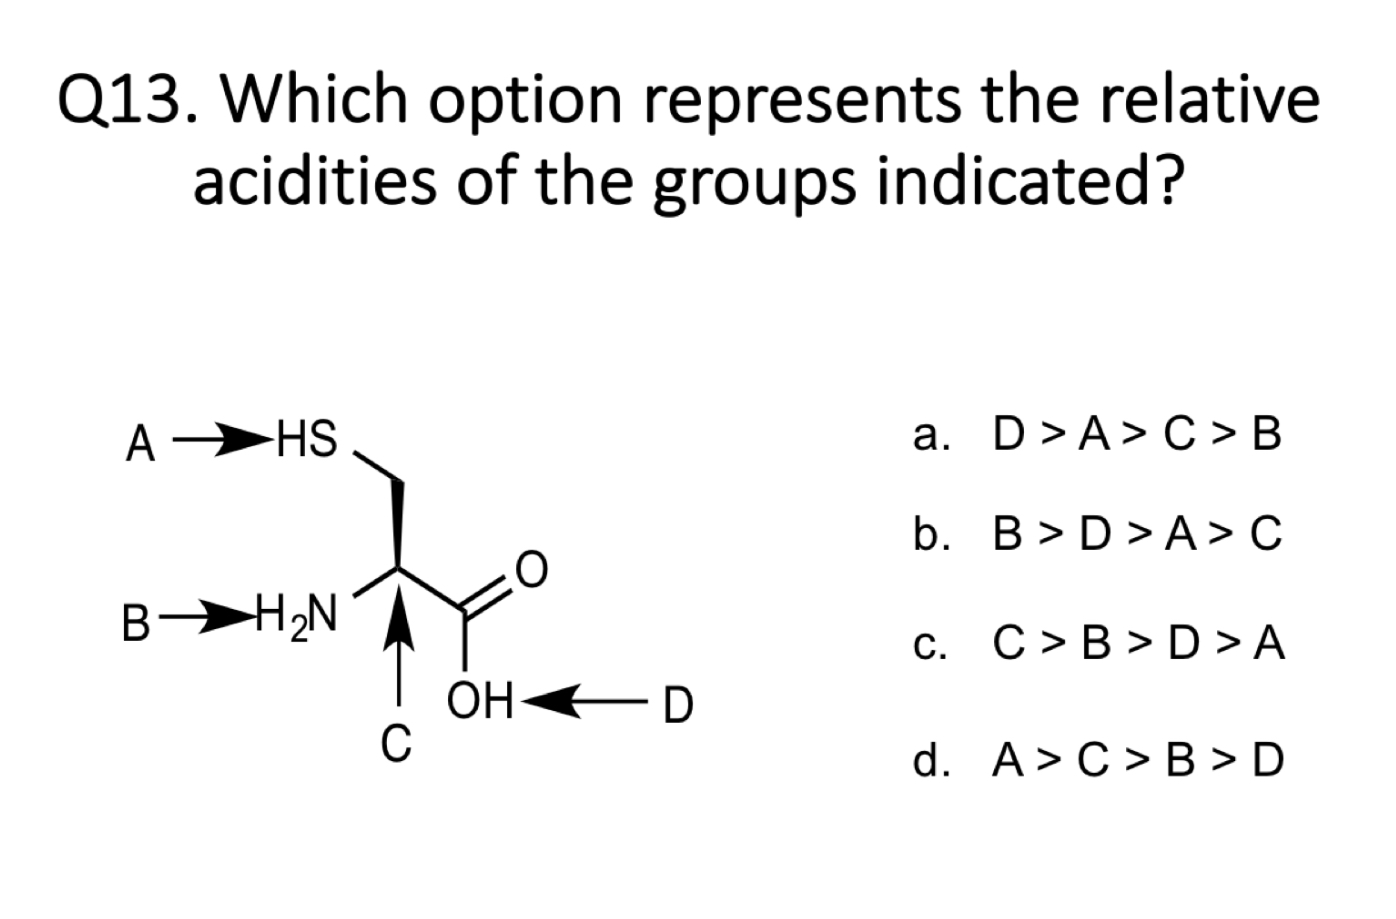 Q13. Which option represents the relative acidities of the groups indicated? A HS a. D >A> C > B b. B>D>A>C C. C>B>D>A B B-HU